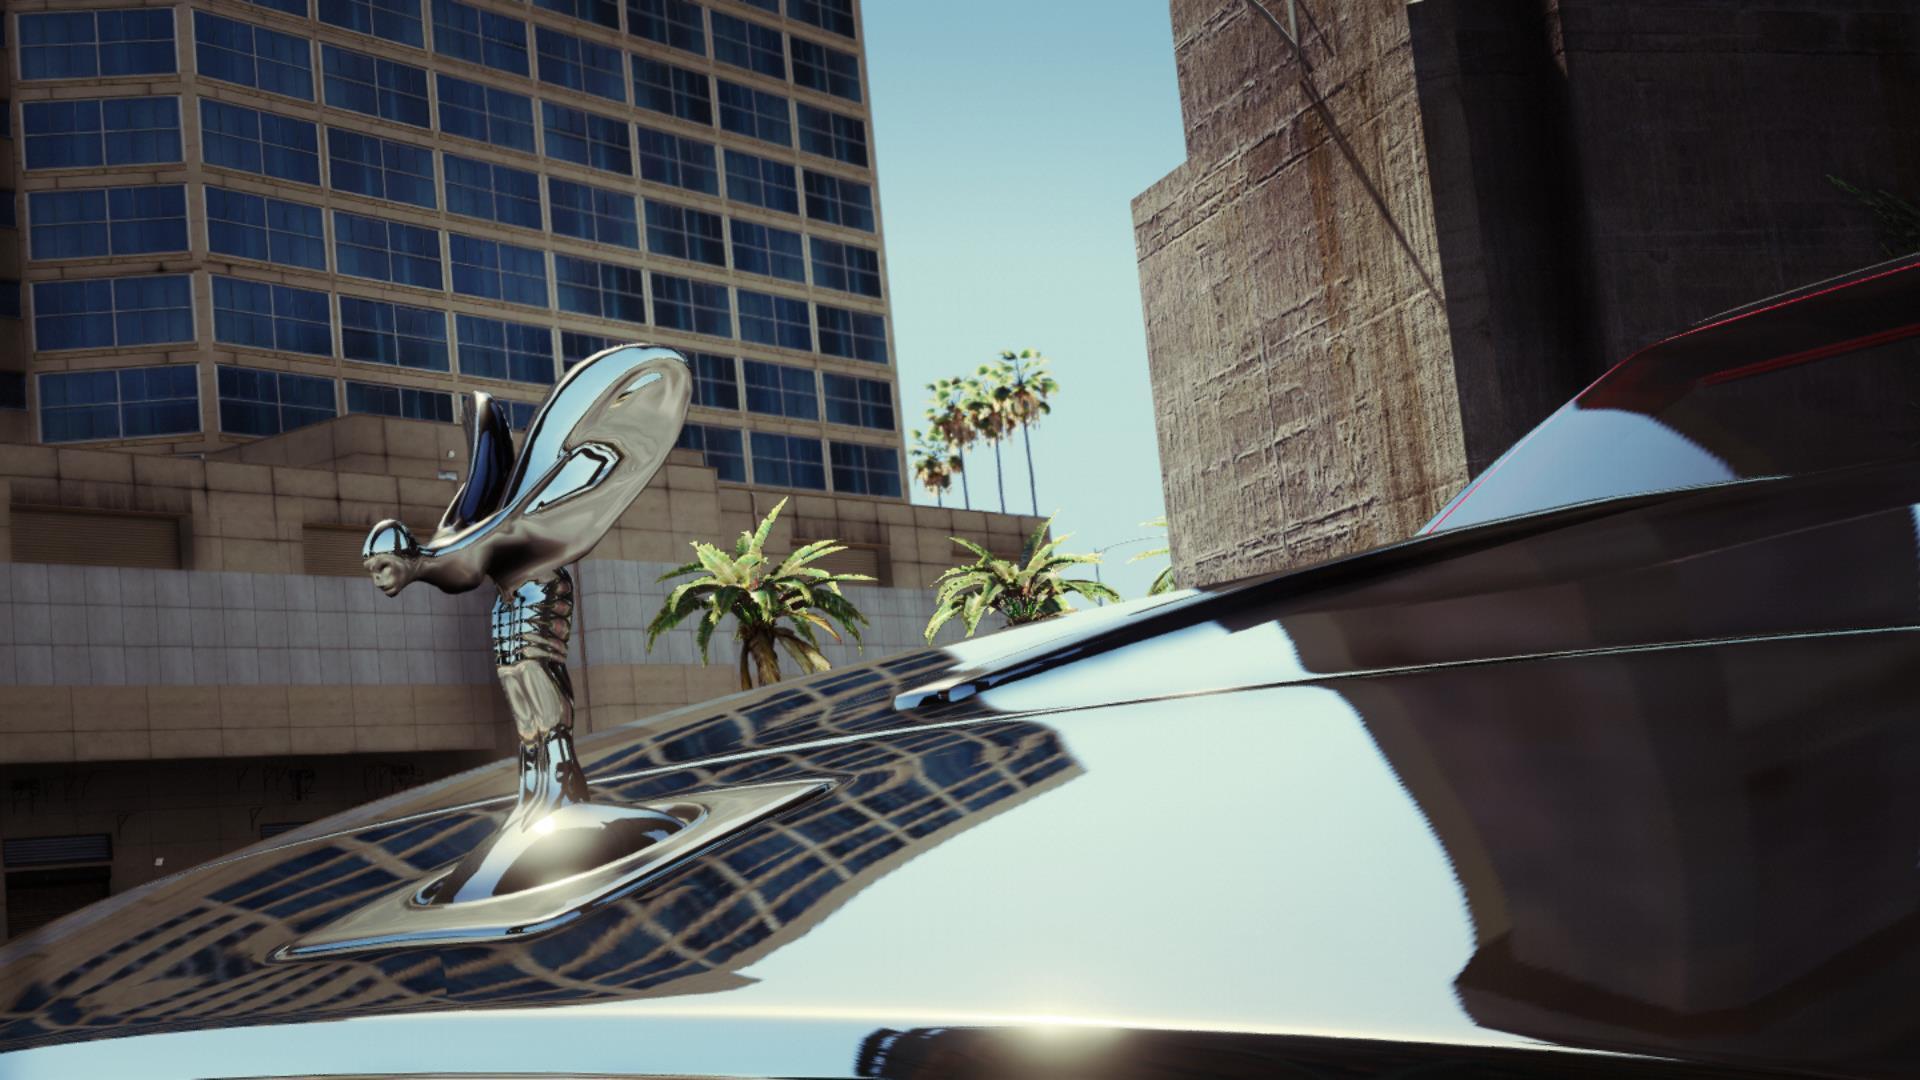 2017 Rolls Royce Dawn [Replace] - GTA5-Mods.com